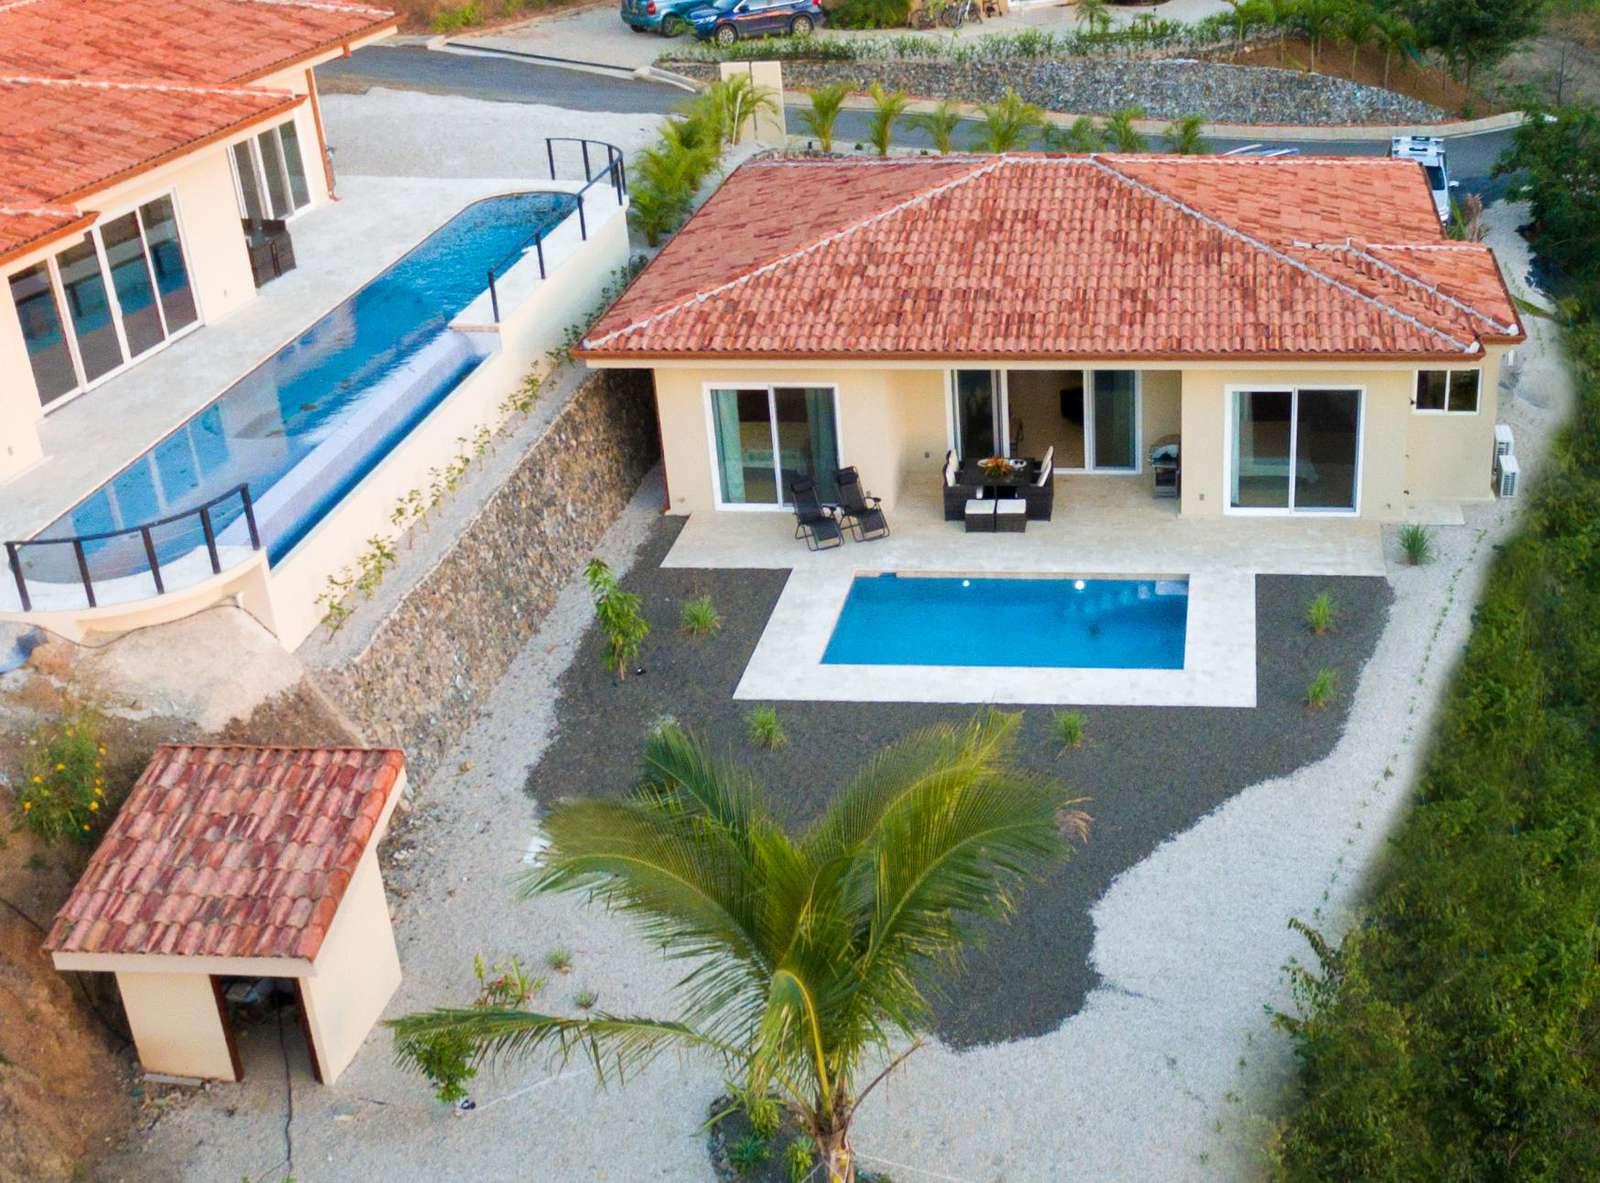 Aerial view of Dos Rios 18